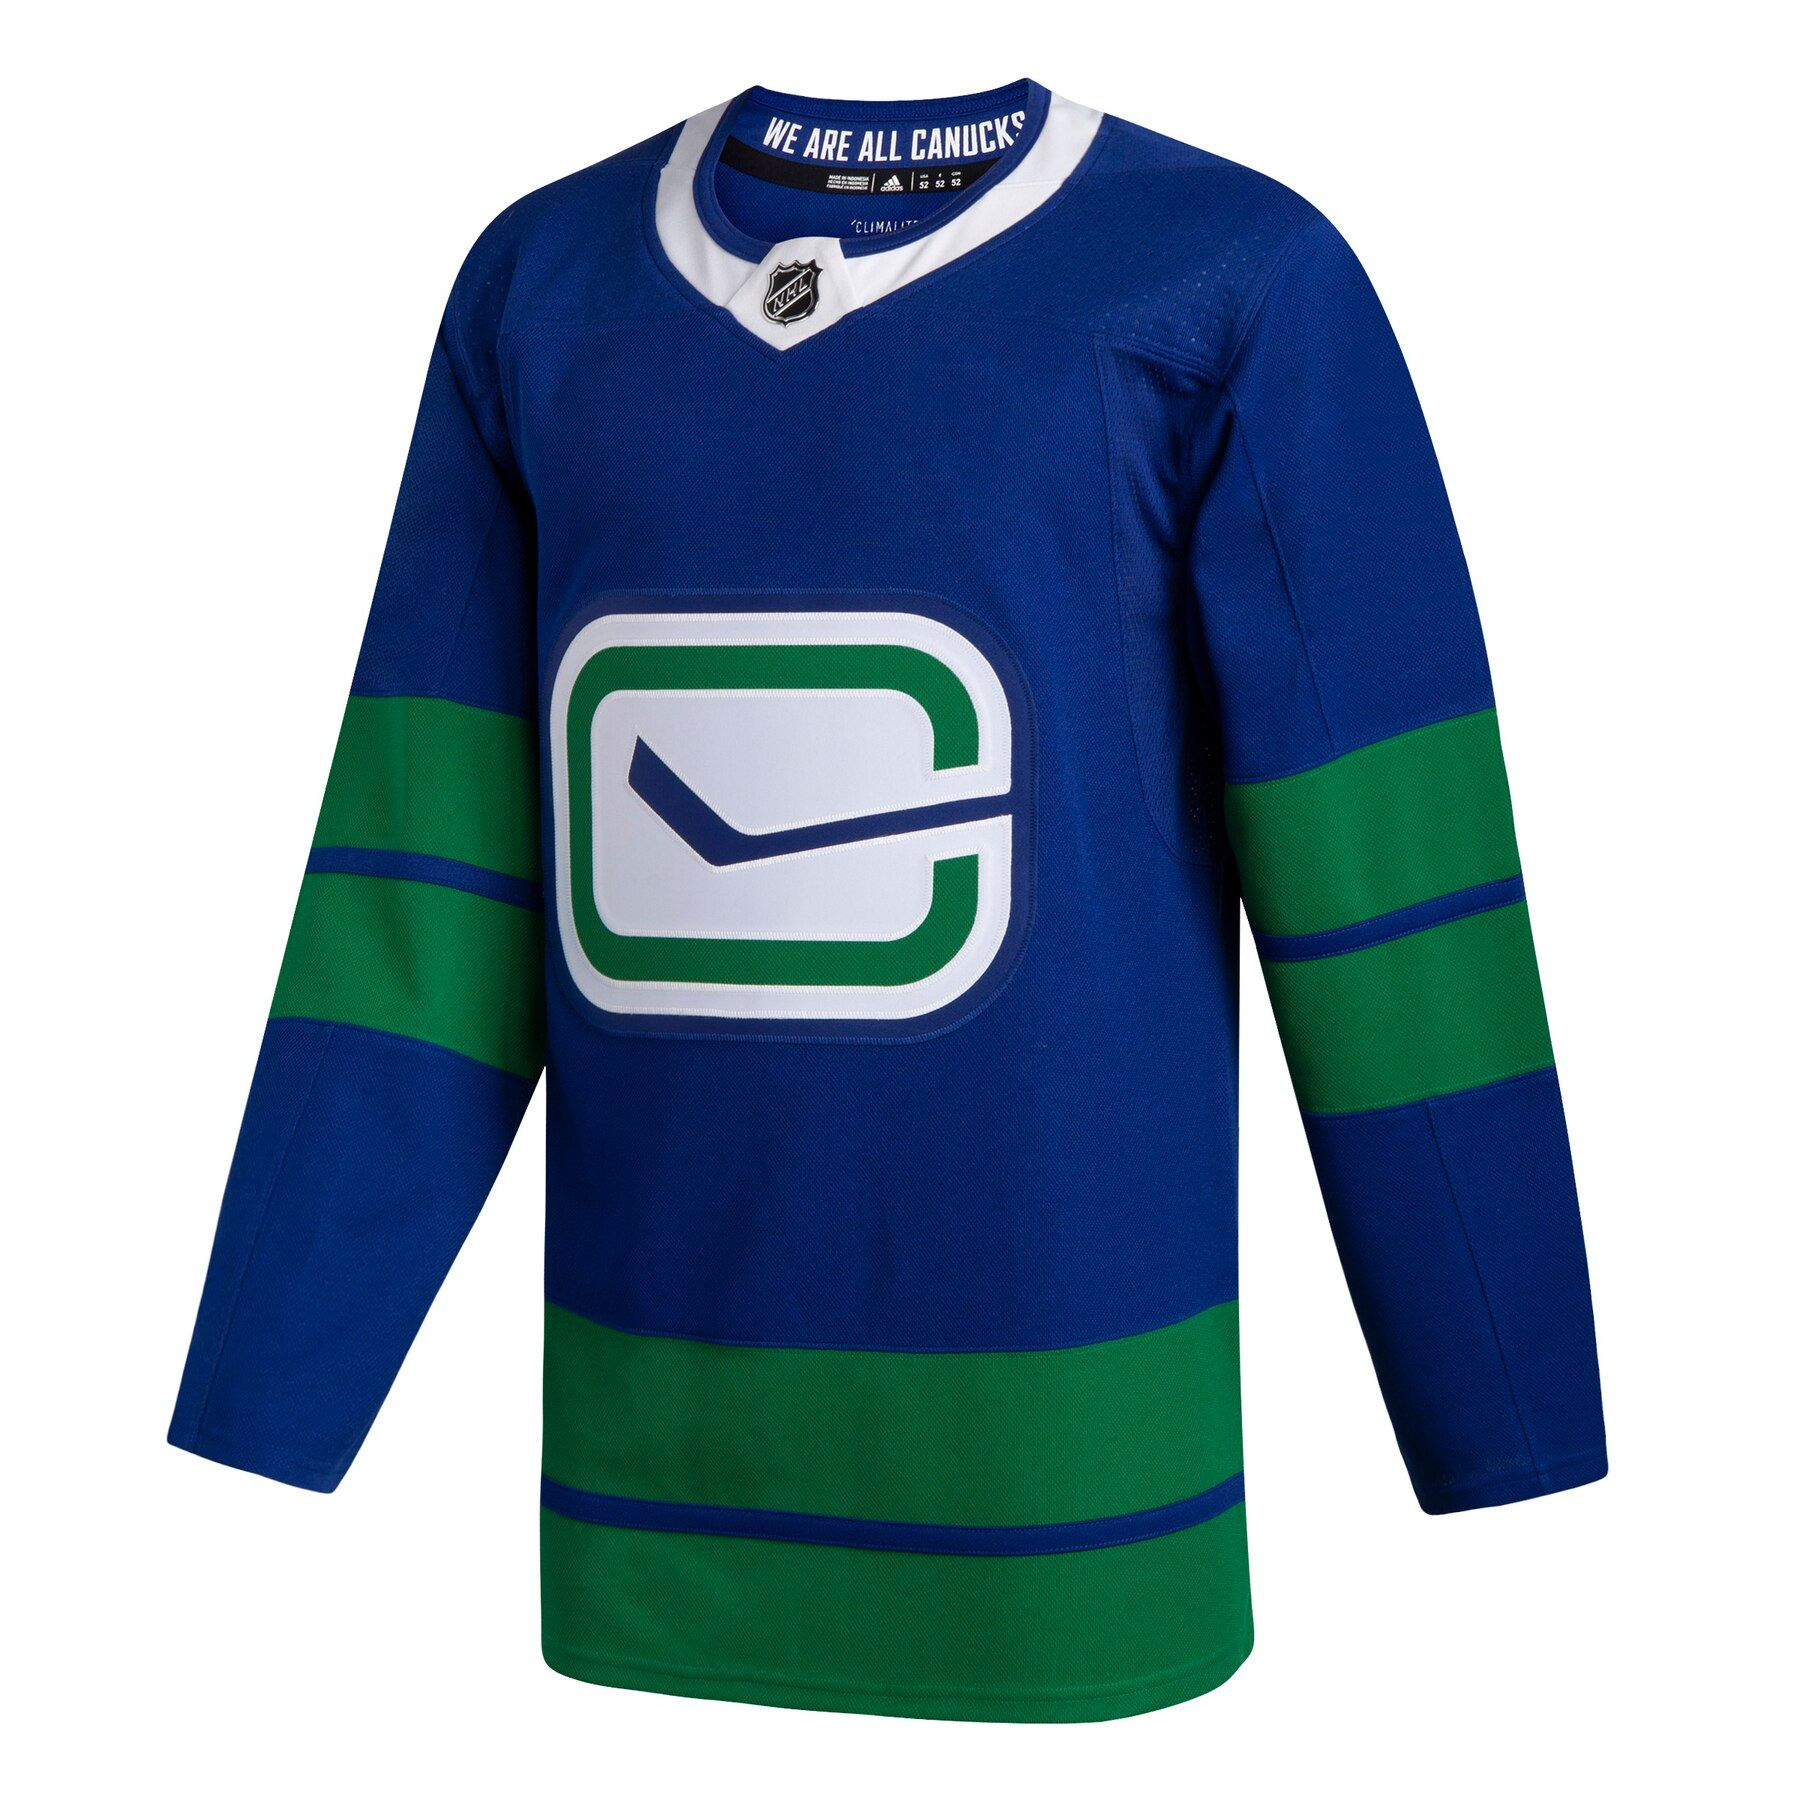 more photos 64c19 7b2e2 Vancouver Canucks adidas adizero NHL Authentic Pro Alternate Jersey